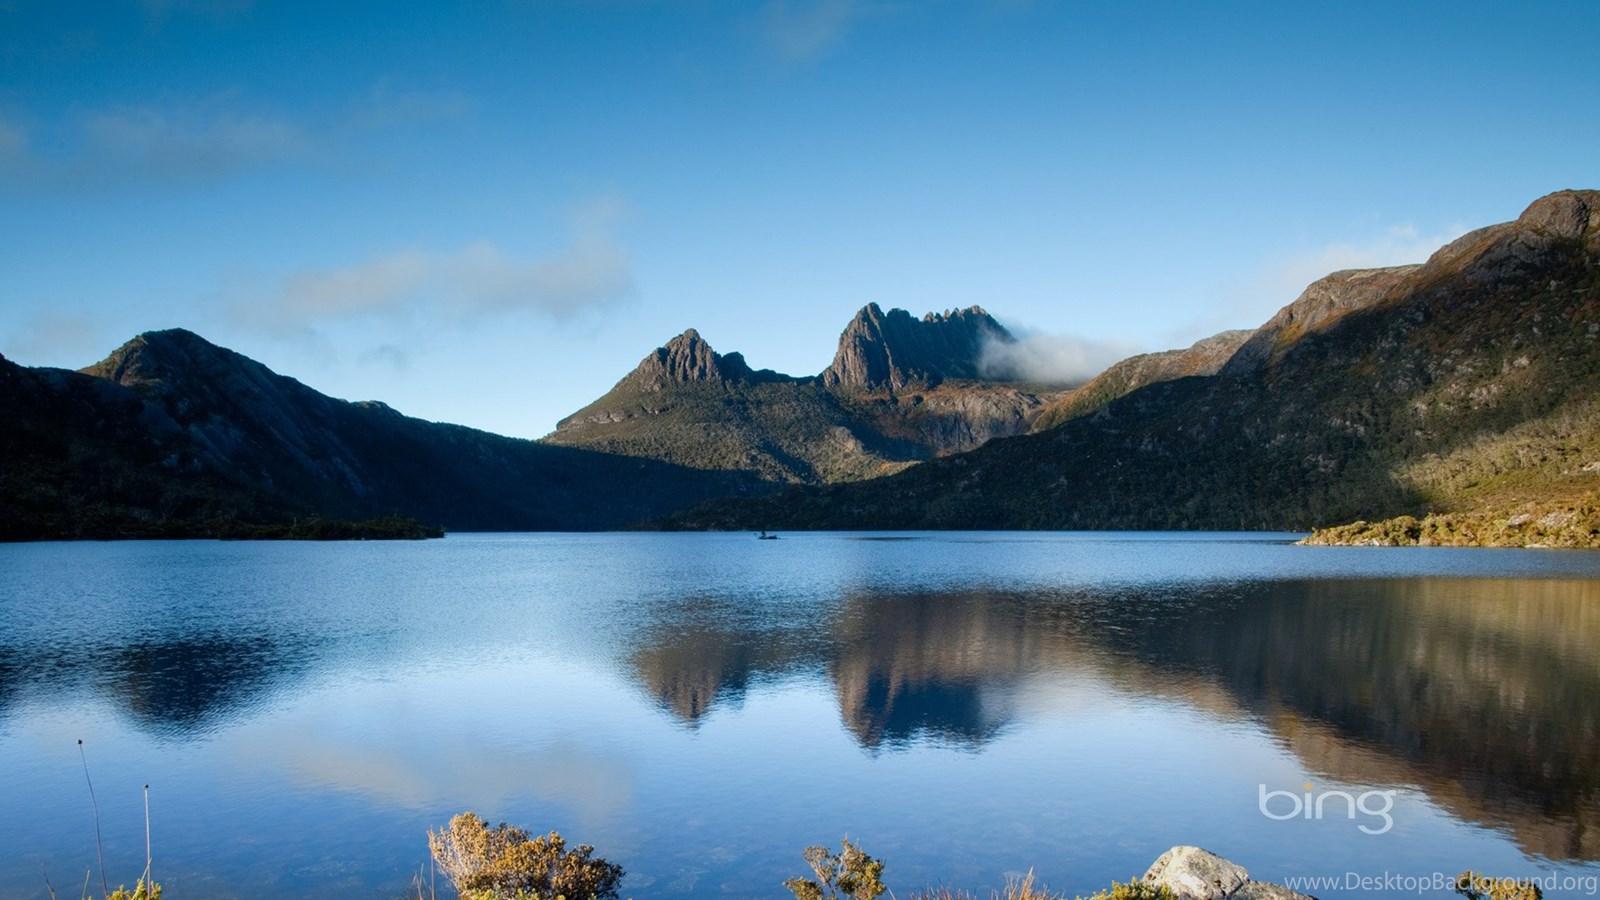 Best Of Bing Australia Australian Landmarks & Animals